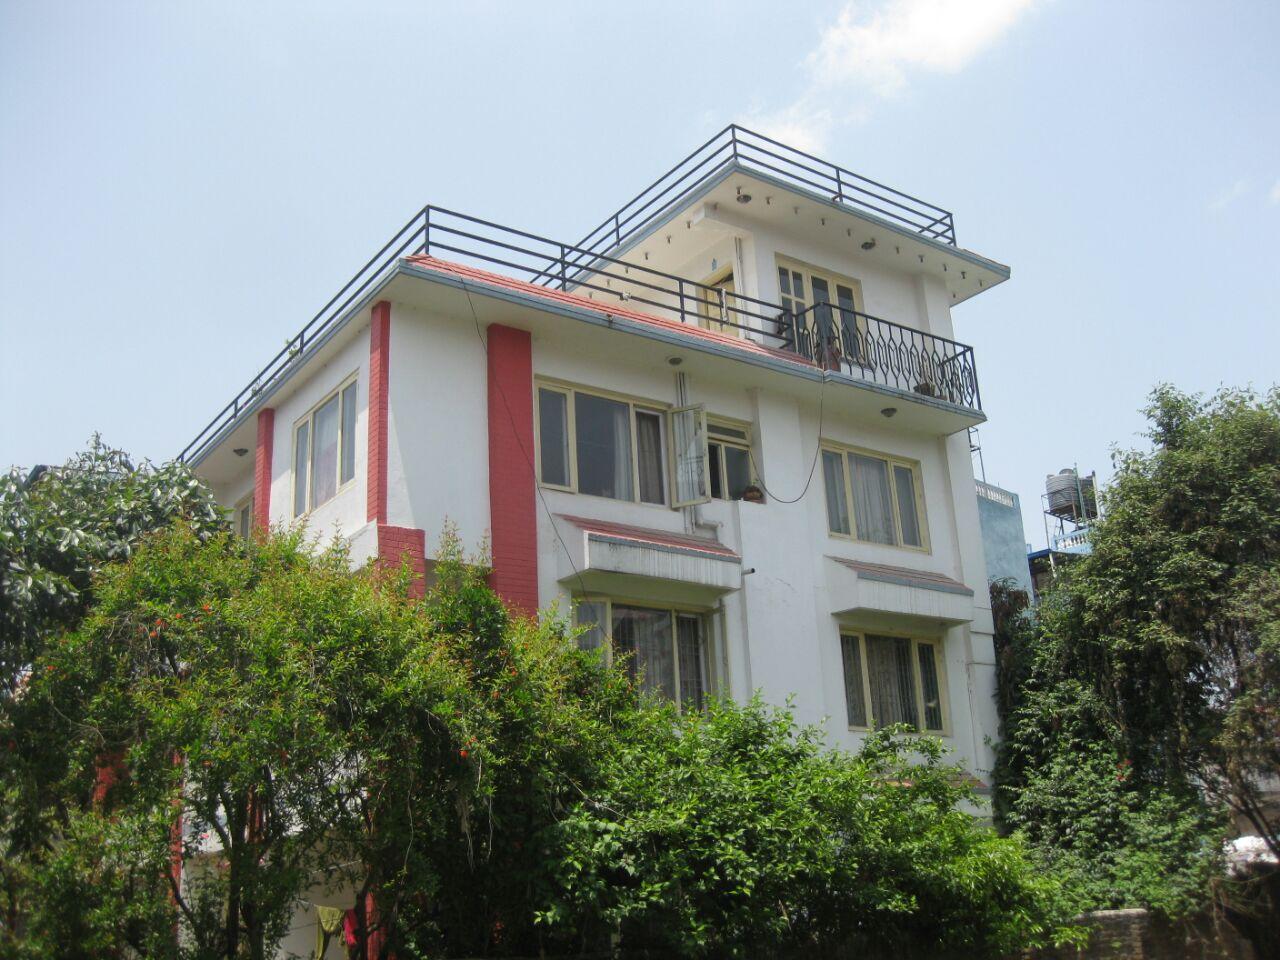 House on Sale at Tinkune , Subidhnagar – IMG-20150504-WA0026